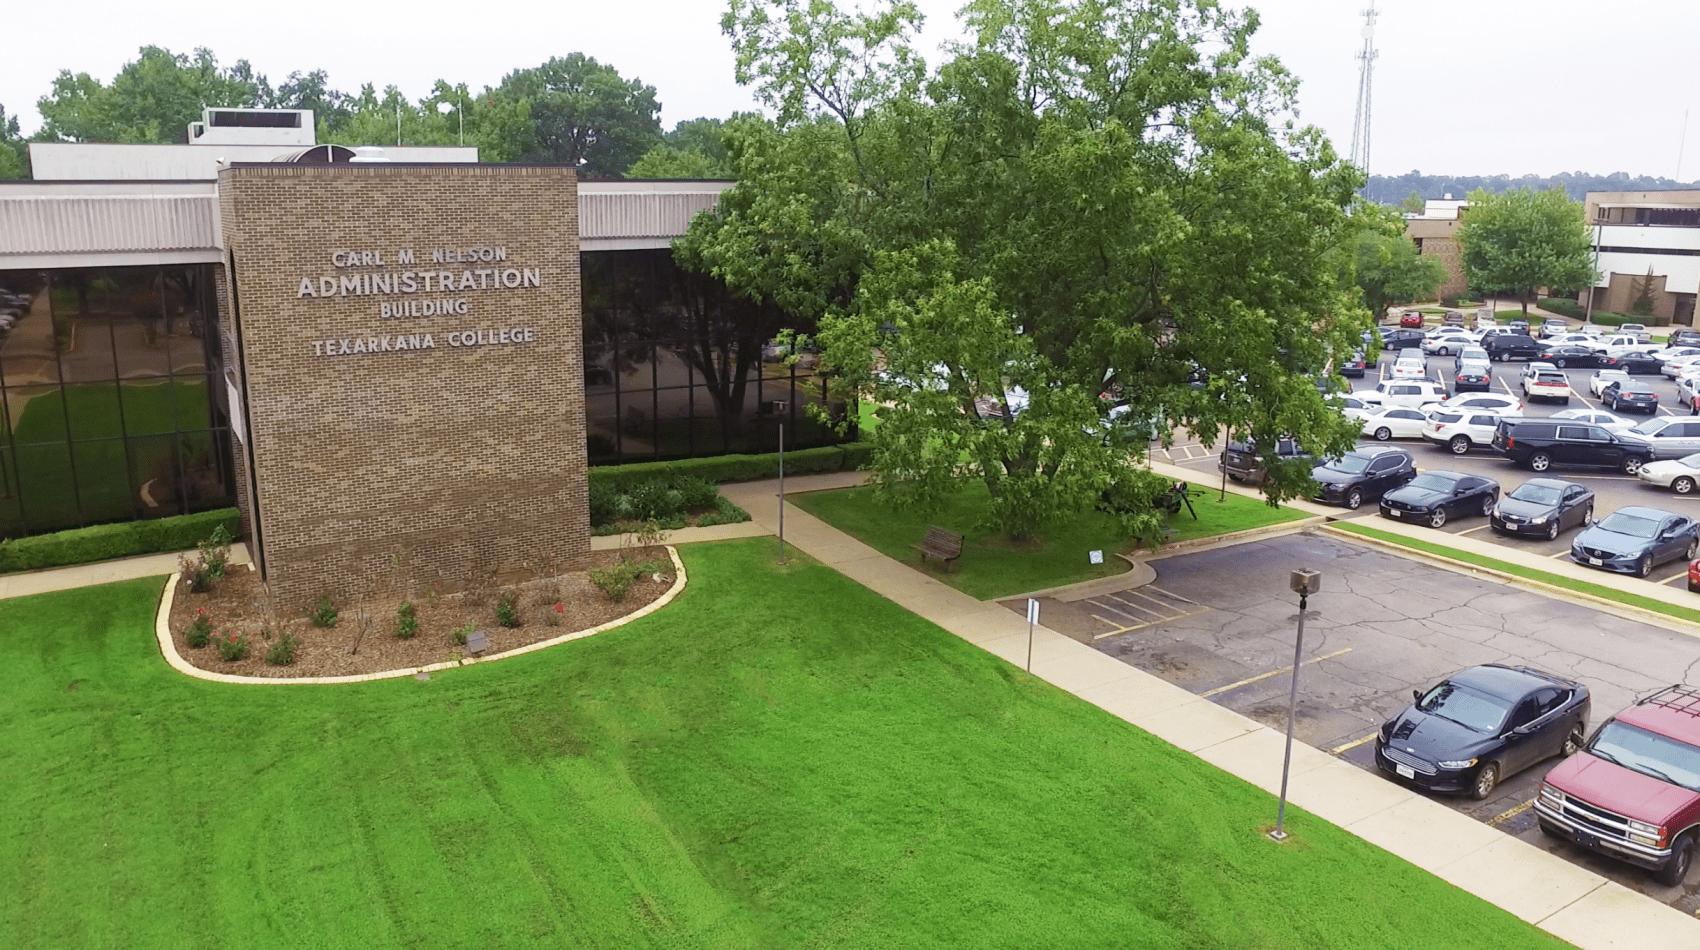 TC Announces Extended Hours for Enrollment & Financial Aid Services